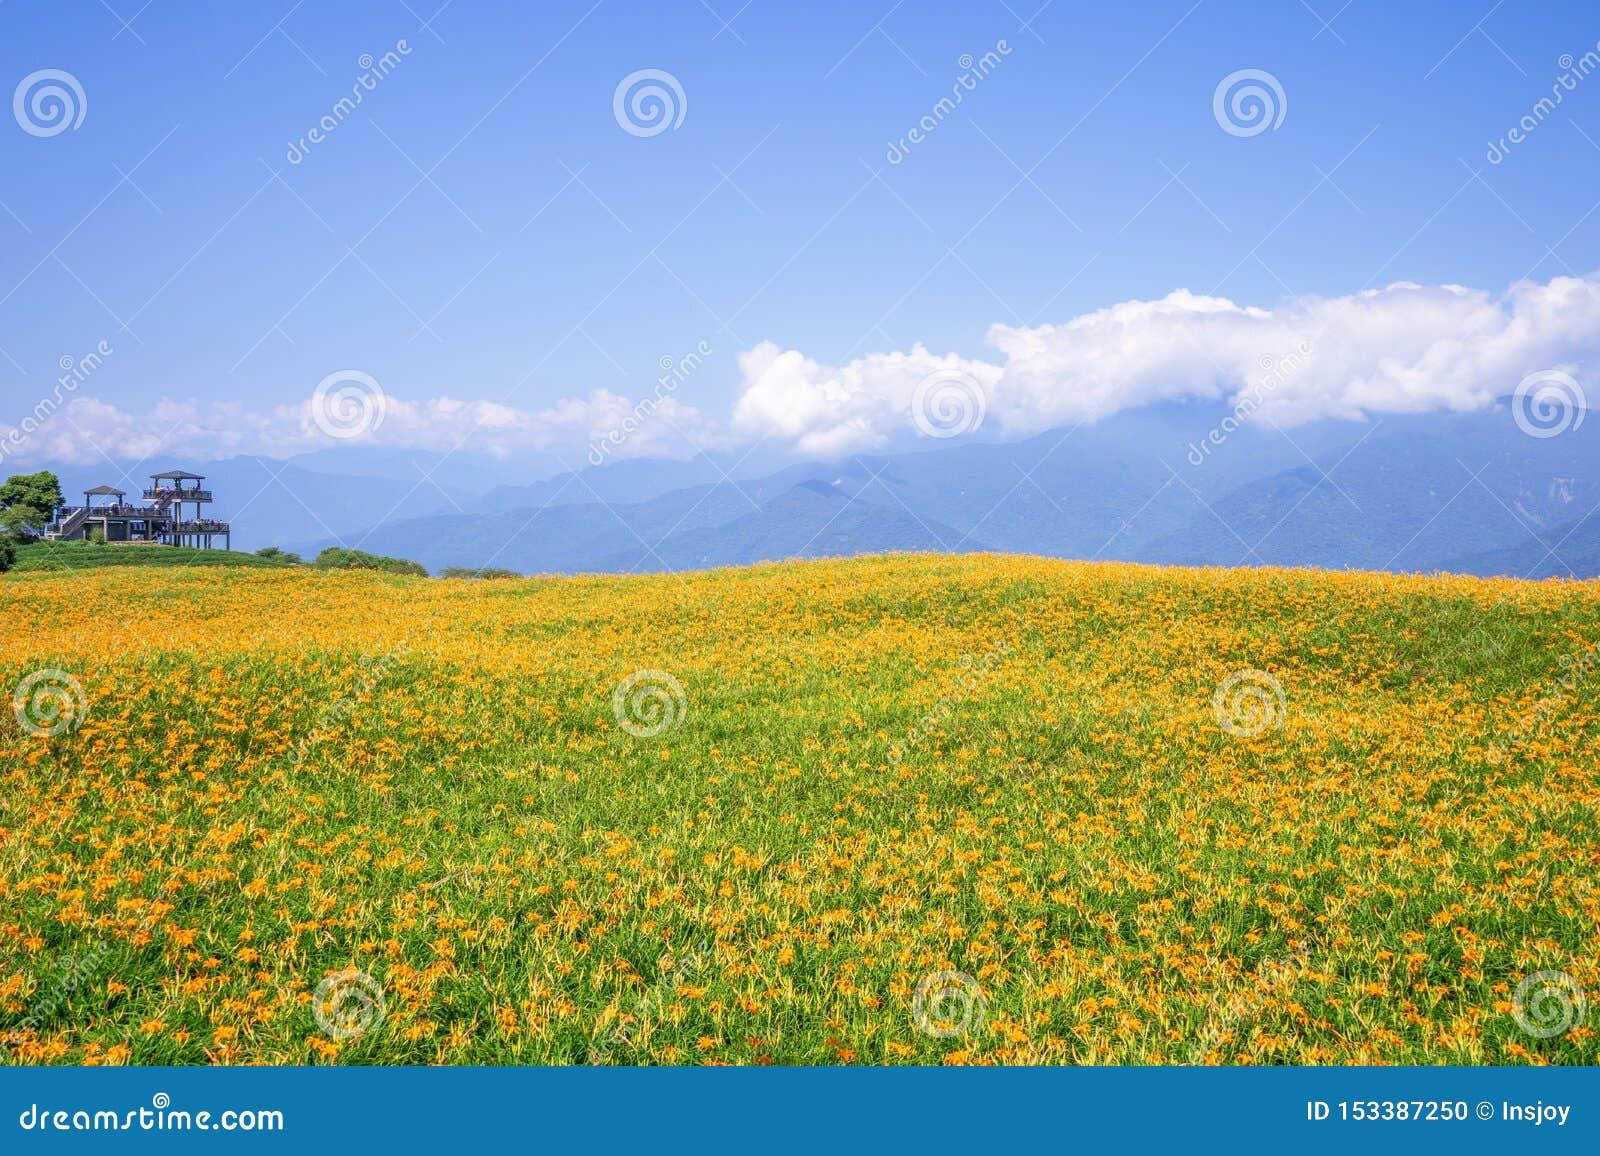 Liushidan山六十岩石山的美丽的橙色黄花菜花农场与天空蔚蓝和云彩在台湾花莲富里乡,